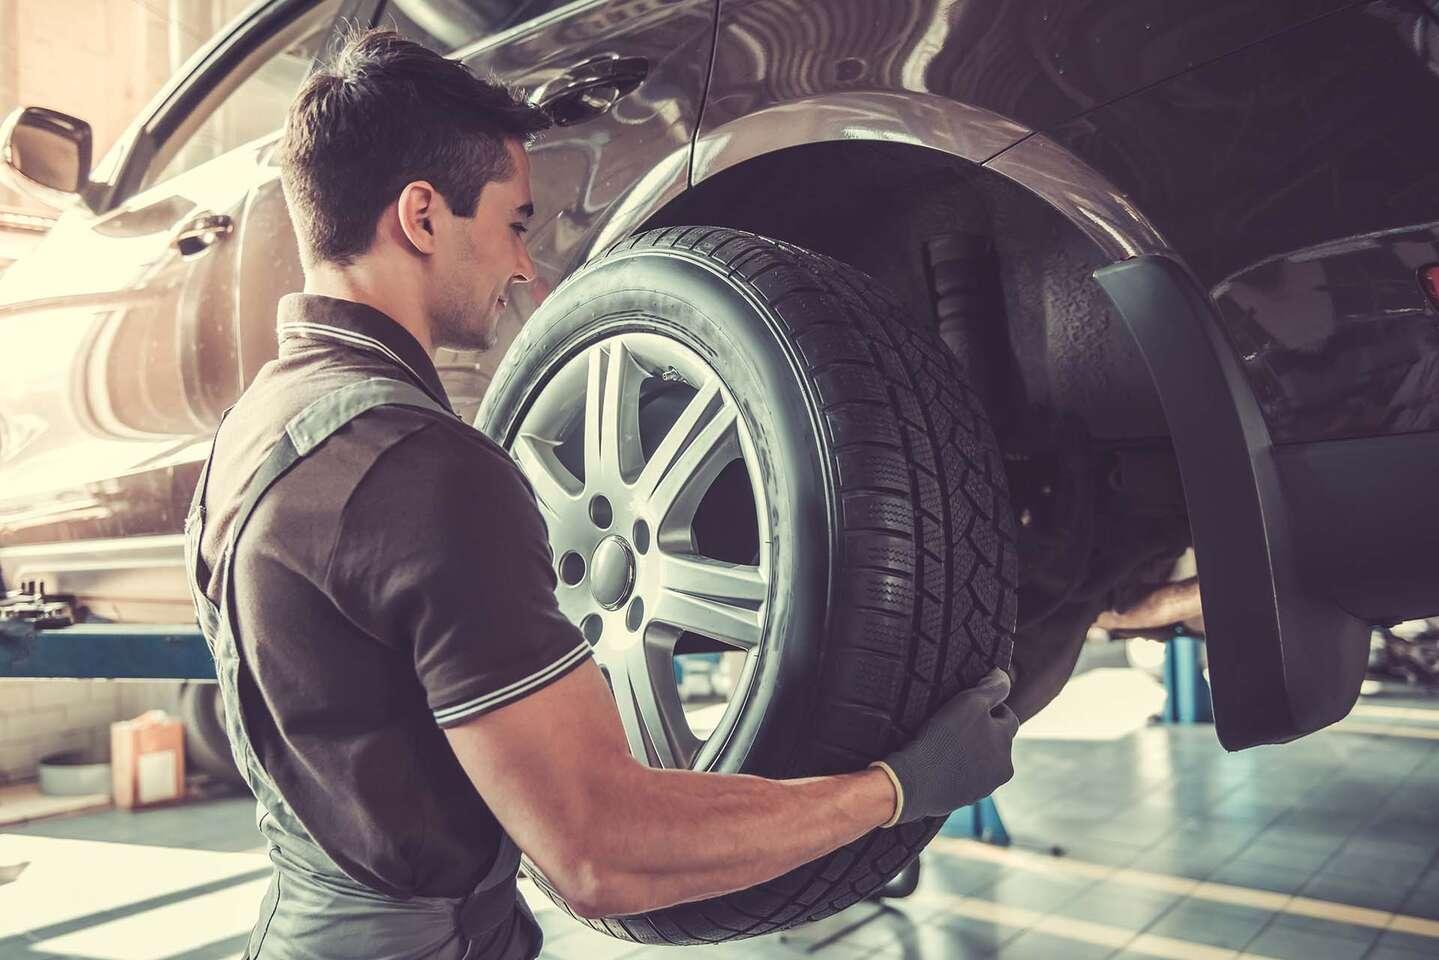 Kompletné prezutie s vyvážením a kontrola technického stavu vozi...